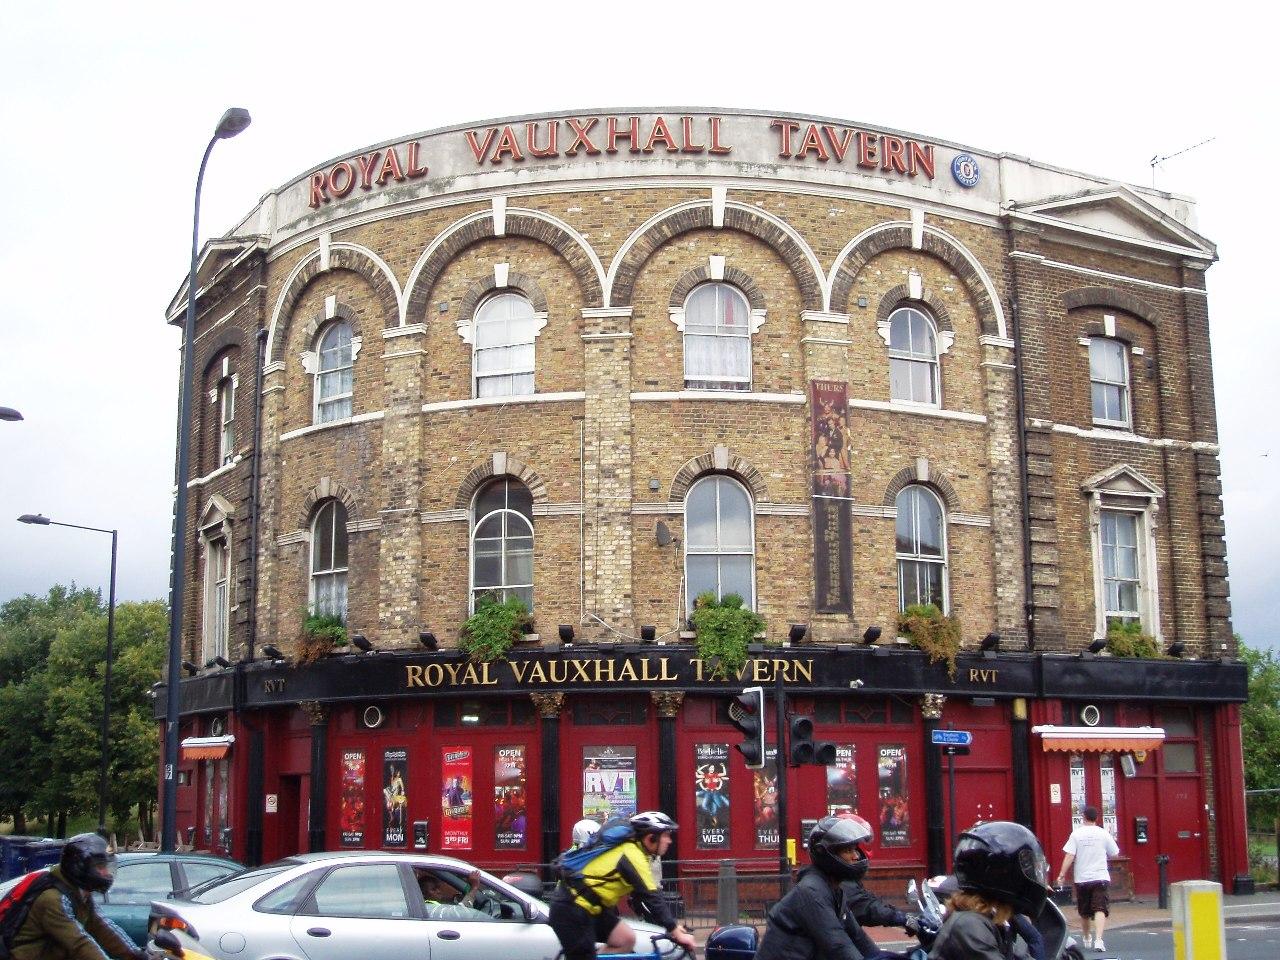 Royal Vauxhall Tavern, Vauxhall, SE11